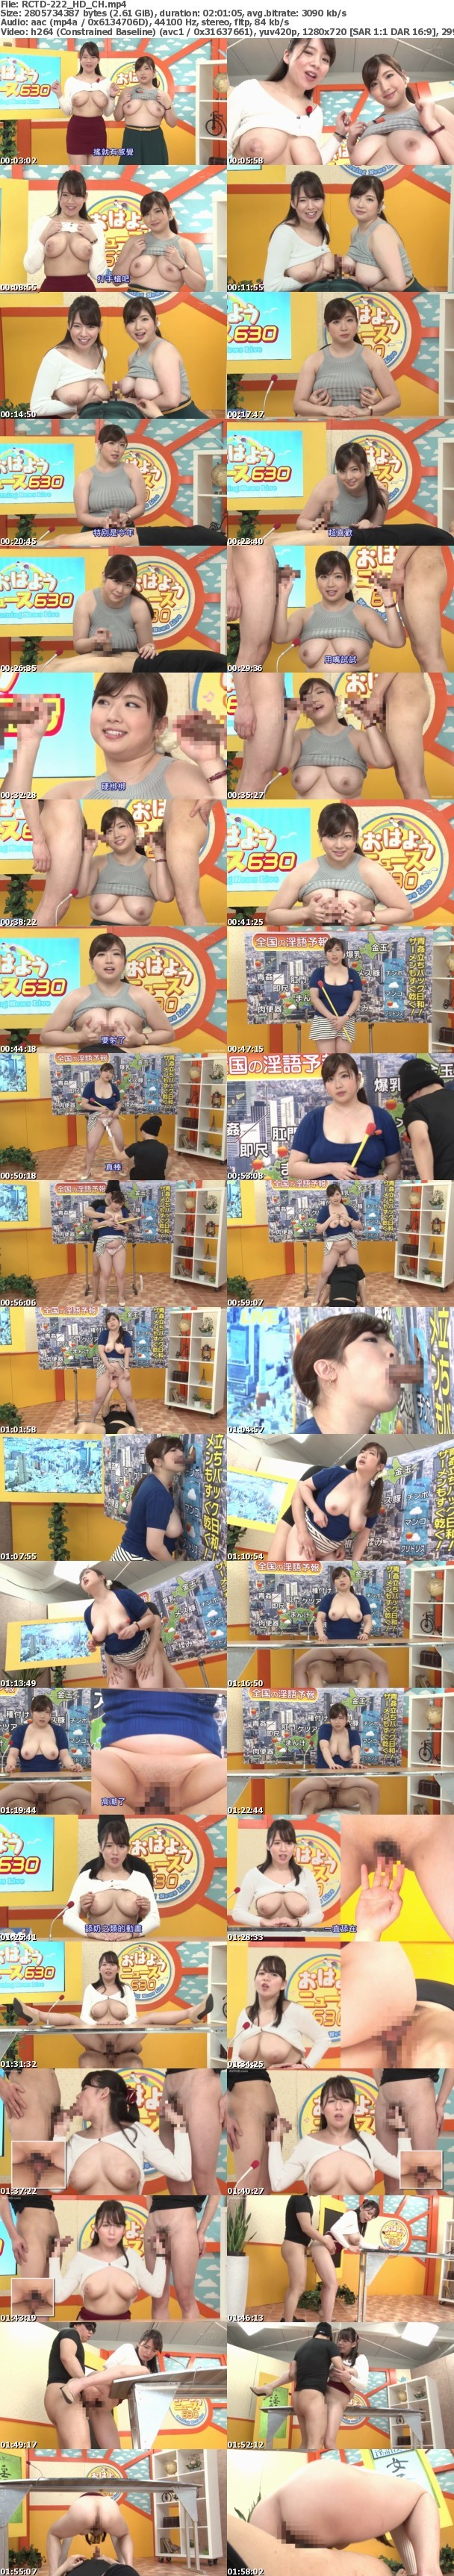 (HD) RCTD-222 淫語女主播17 新年號是爆乳! ?雙爆乳主播SP[有碼高清中文字幕]